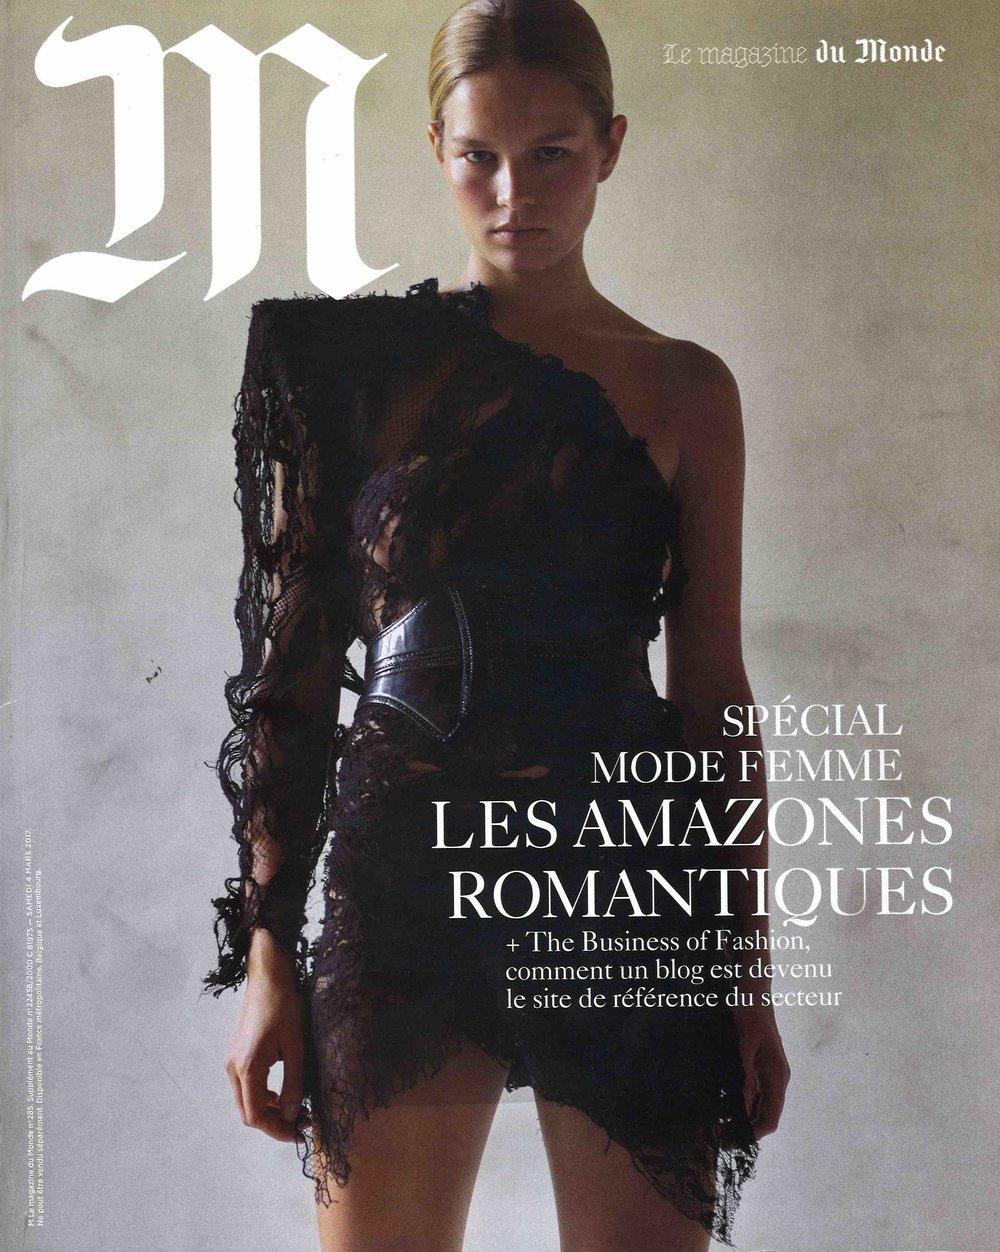 M Le Monde Cover